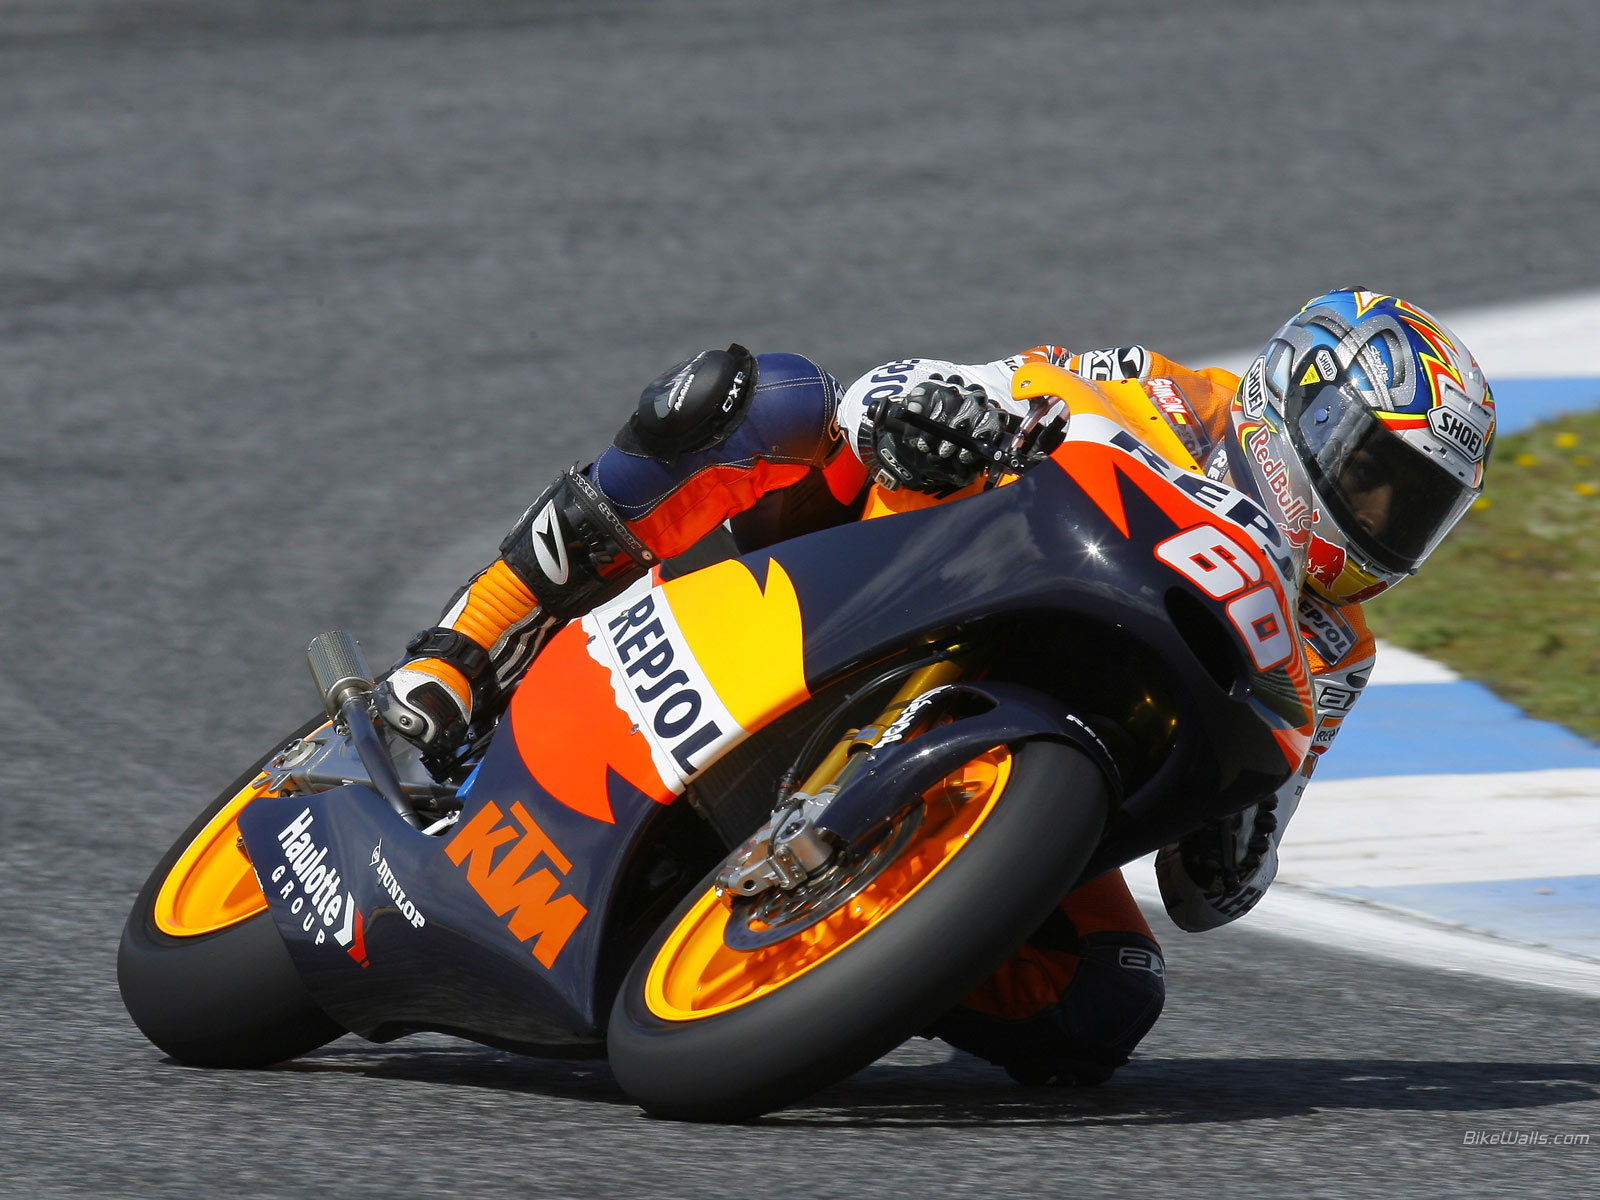 Download High quality MotoGP Wallpaper Num 13 1600 x 1200 285 1600x1200